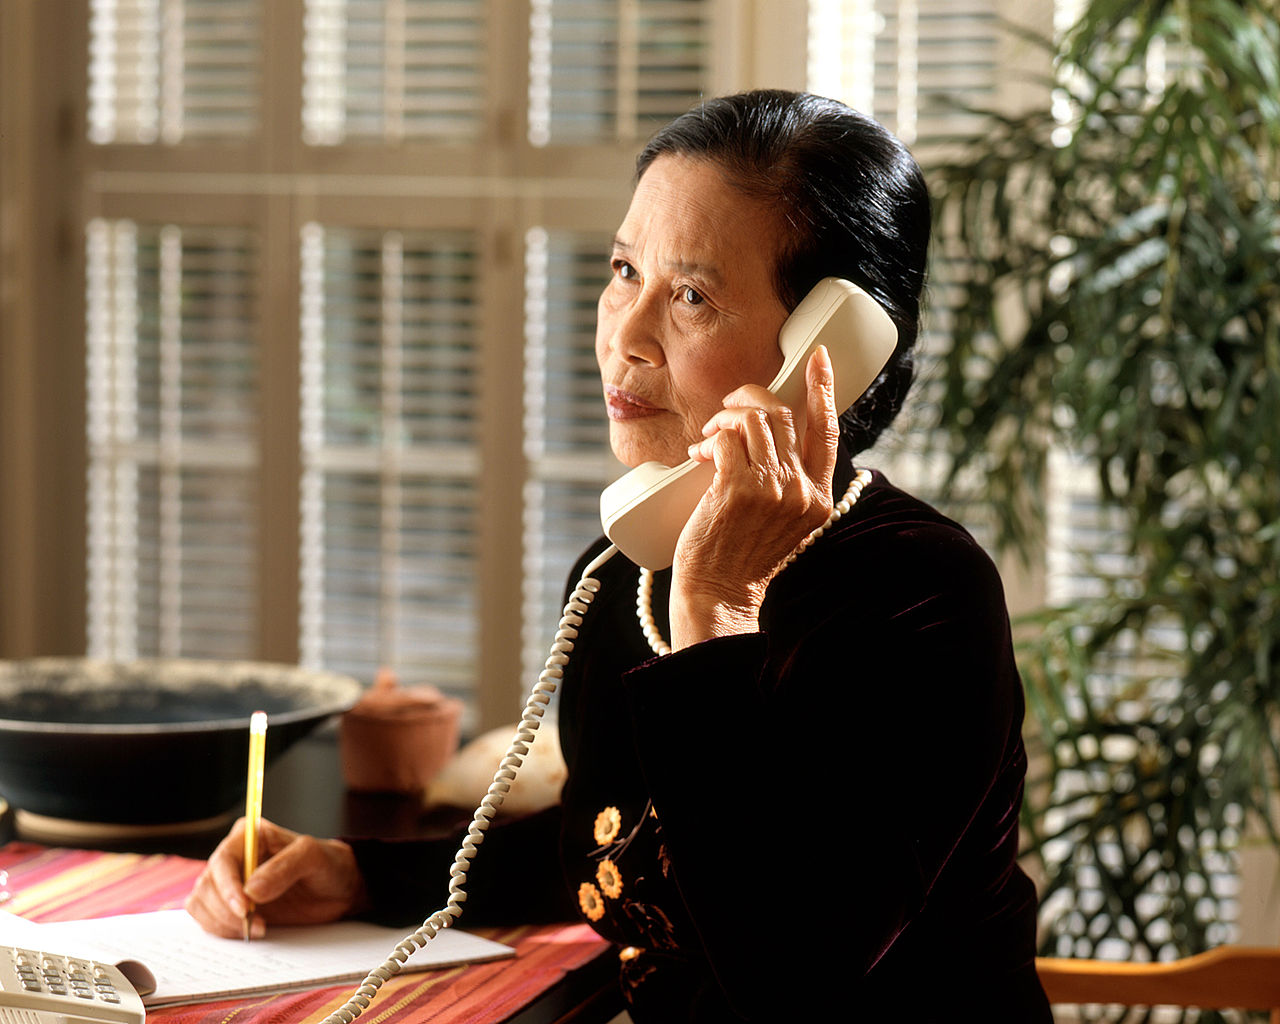 https://commons.wikimedia.org/wiki/File:Woman_talking_on_phone.jpg